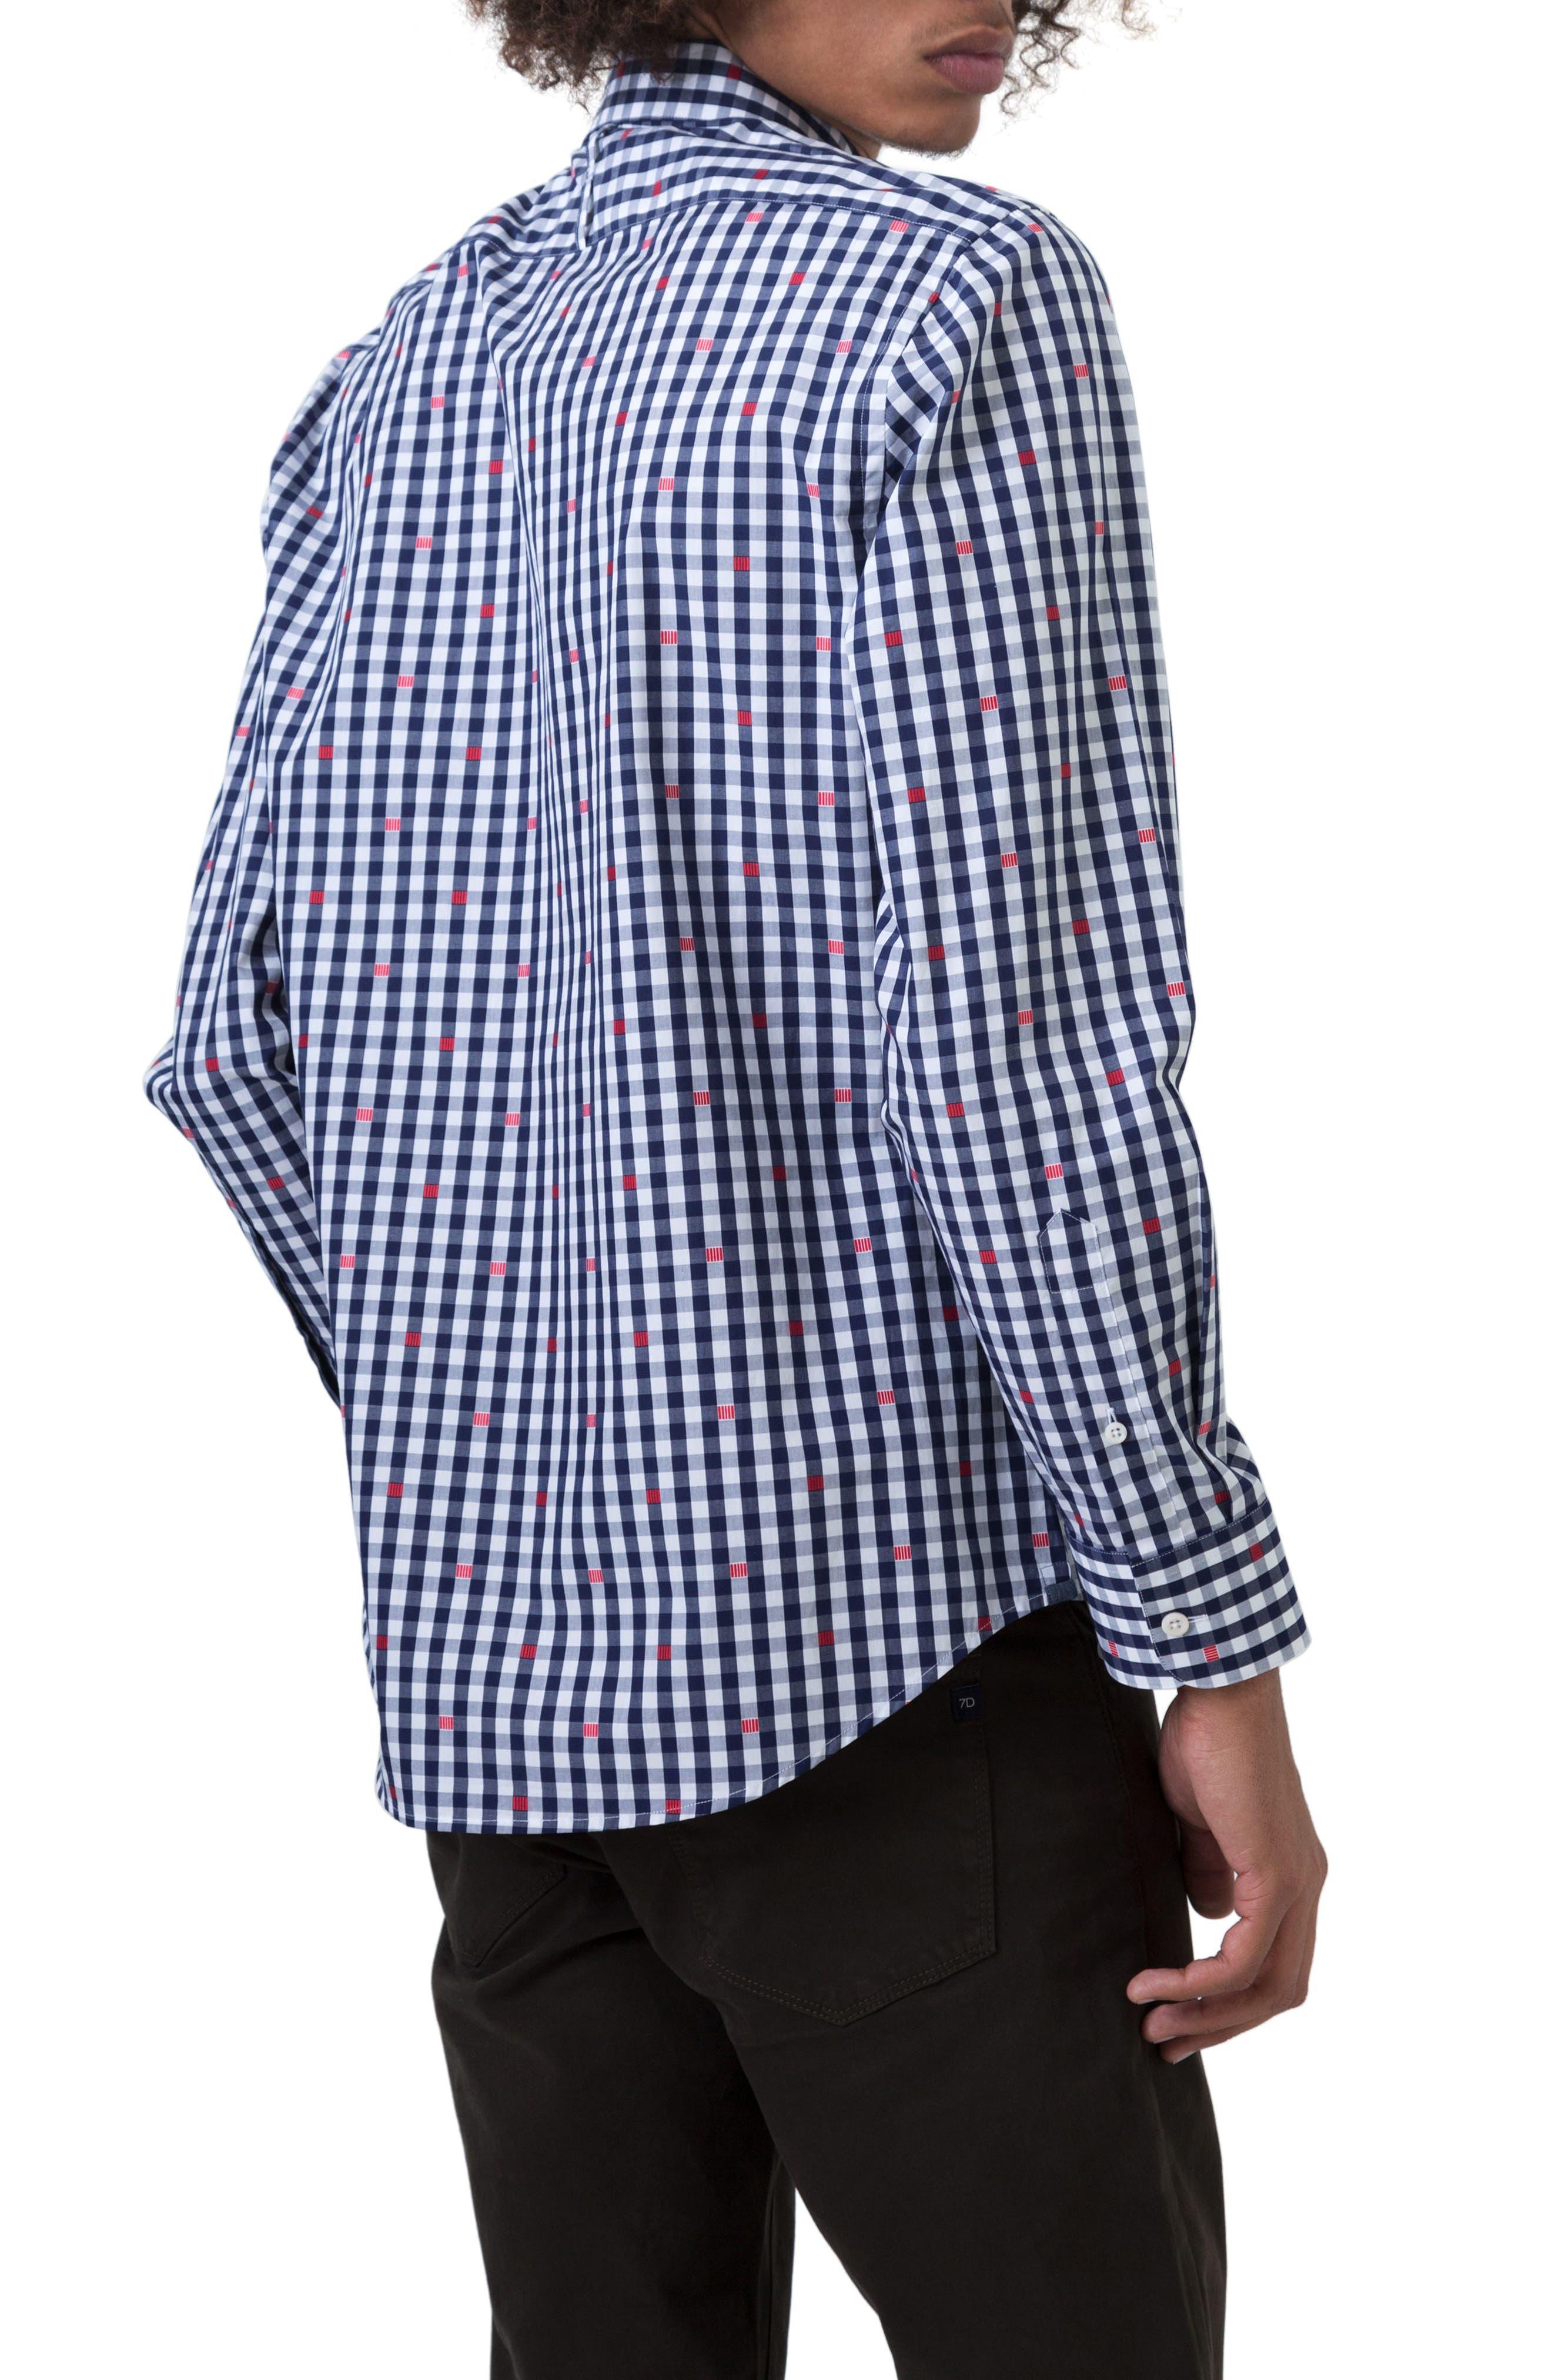 Petrichor Woven Shirt,                             Alternate thumbnail 2, color,                             Navy